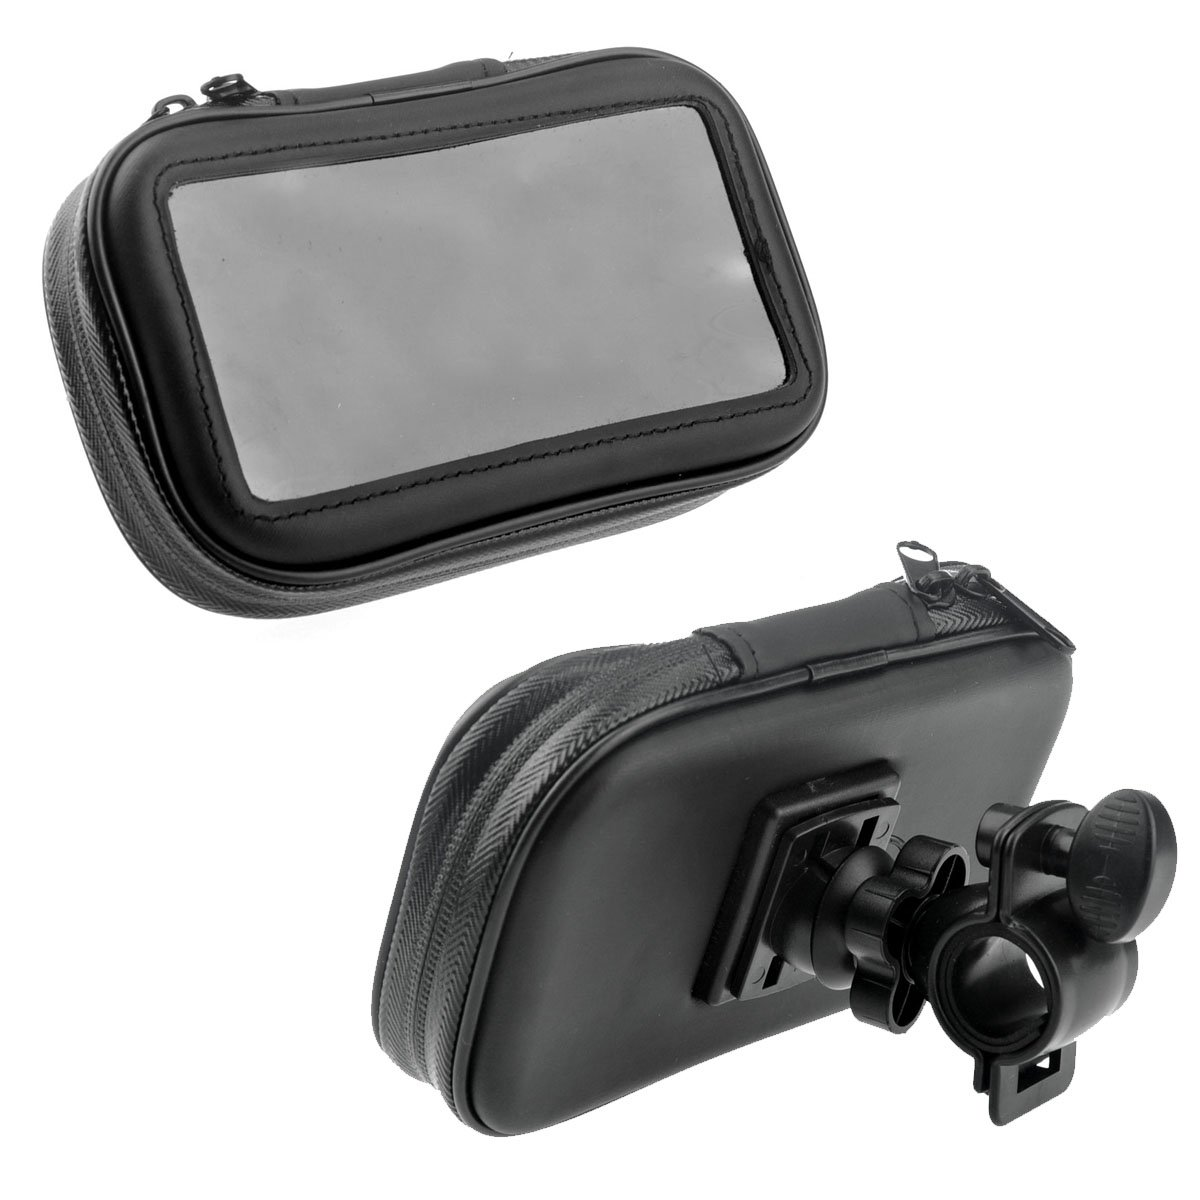 Tinksky móvil para bicicleta, moto, bicicleta bolsa Caja estanca con tapa y función atril para tablet de 4,3